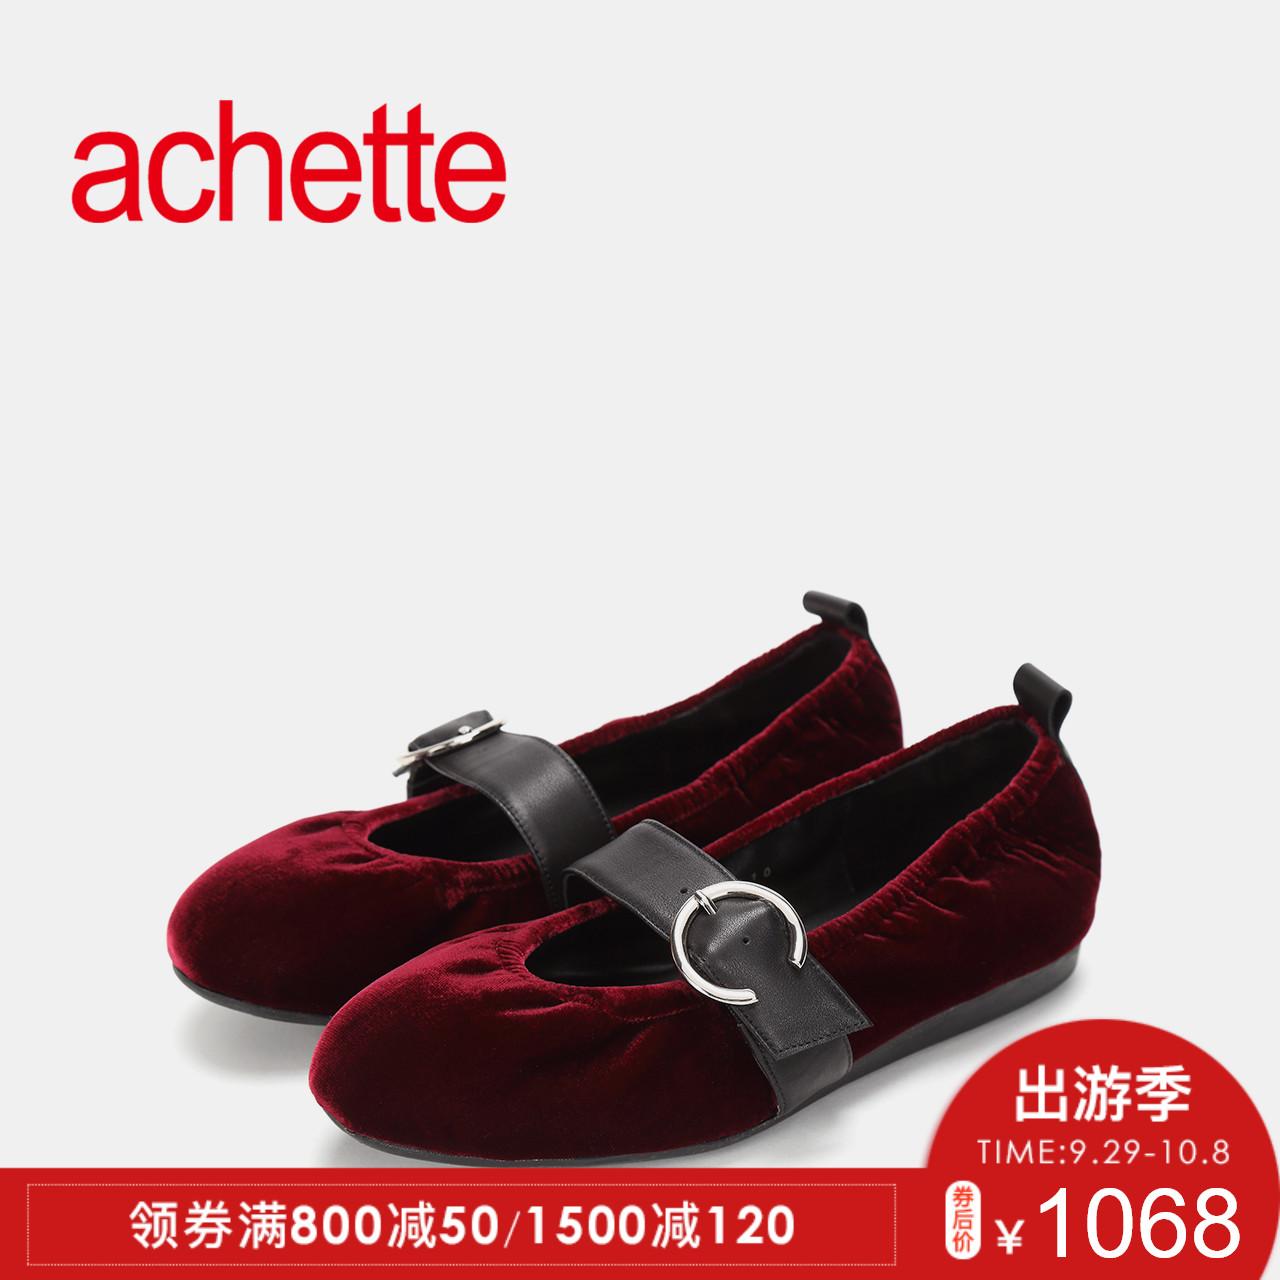 achette雅氏9KX3 秋冬款摩登丝绒皮带装饰复古单鞋